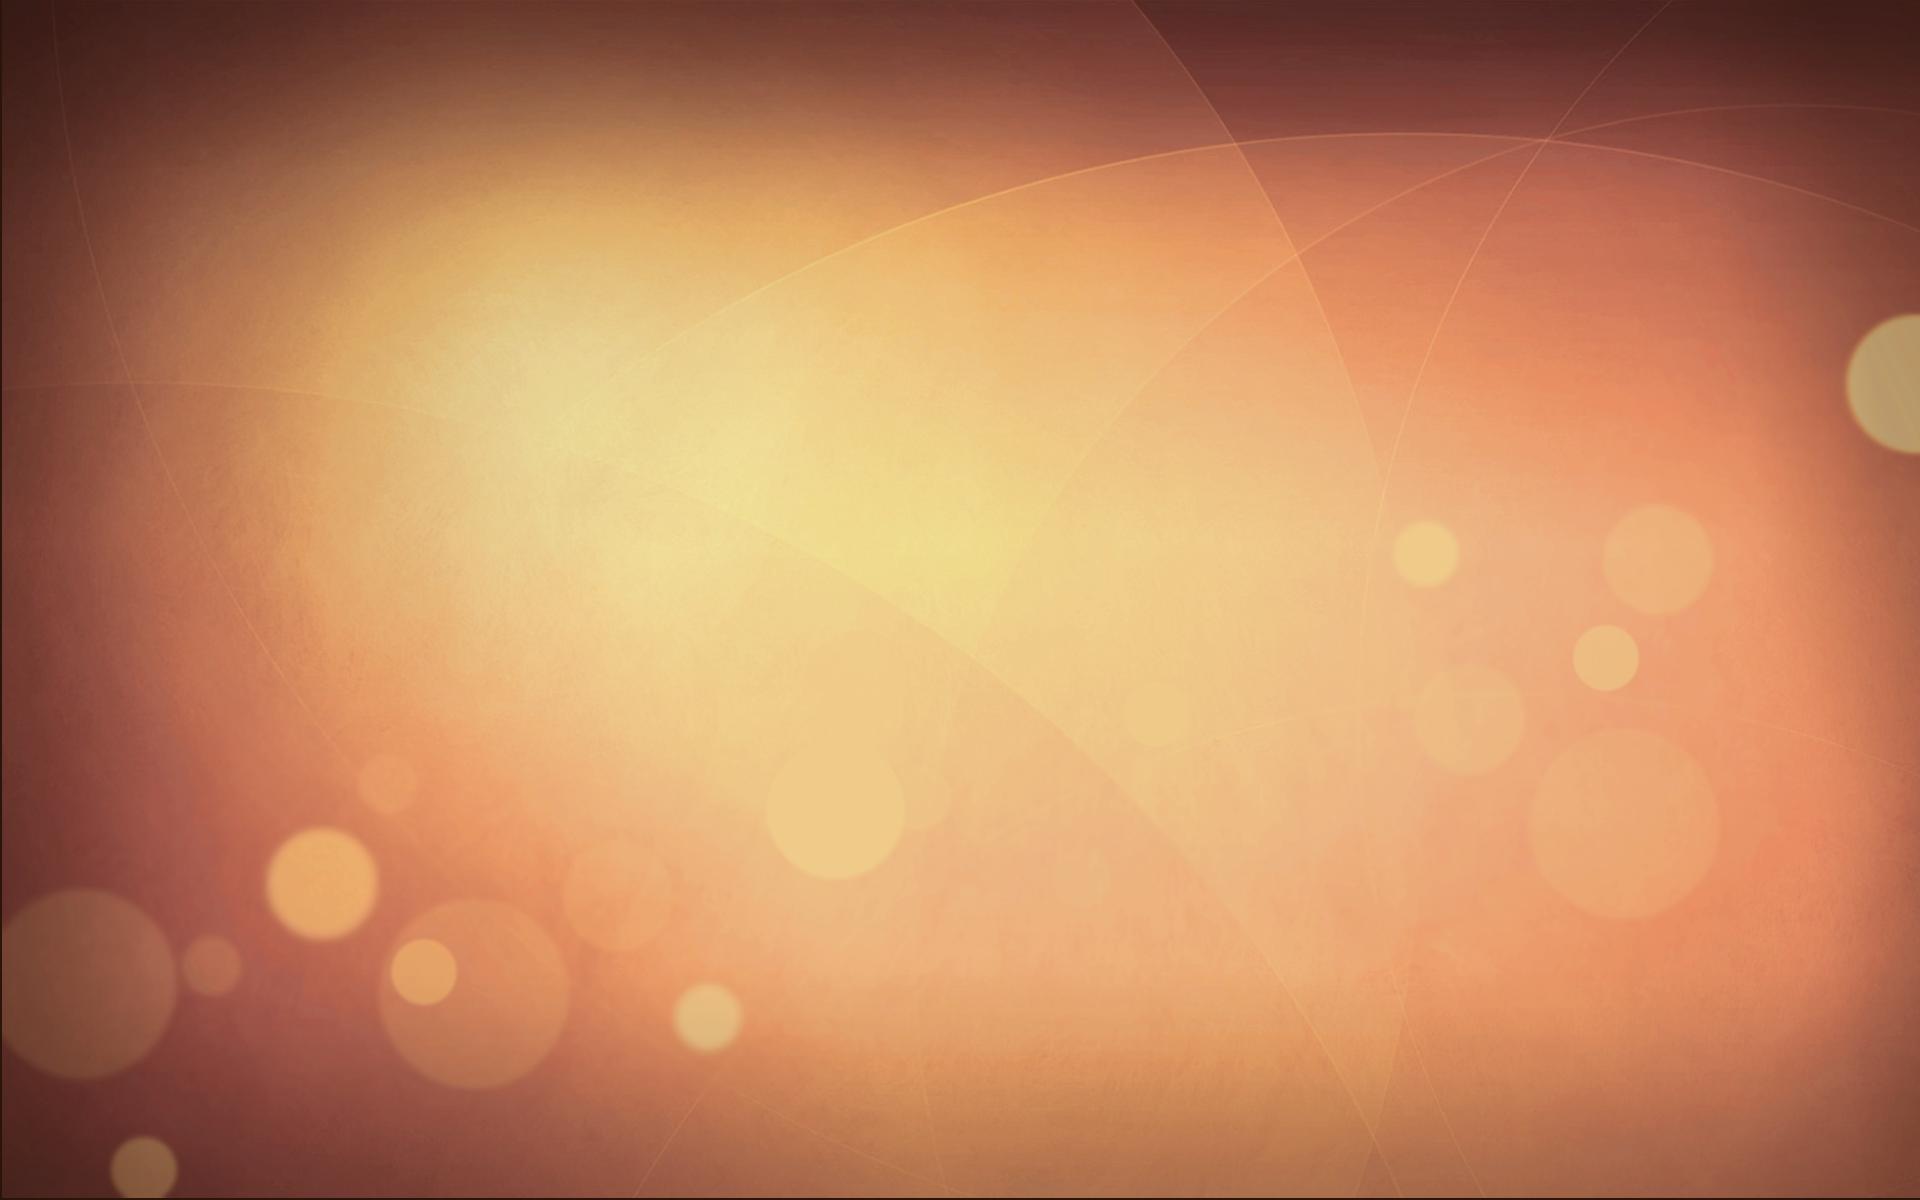 Ubuntu 904 Wallpaper No Jackalope BeginLinux 1920x1200